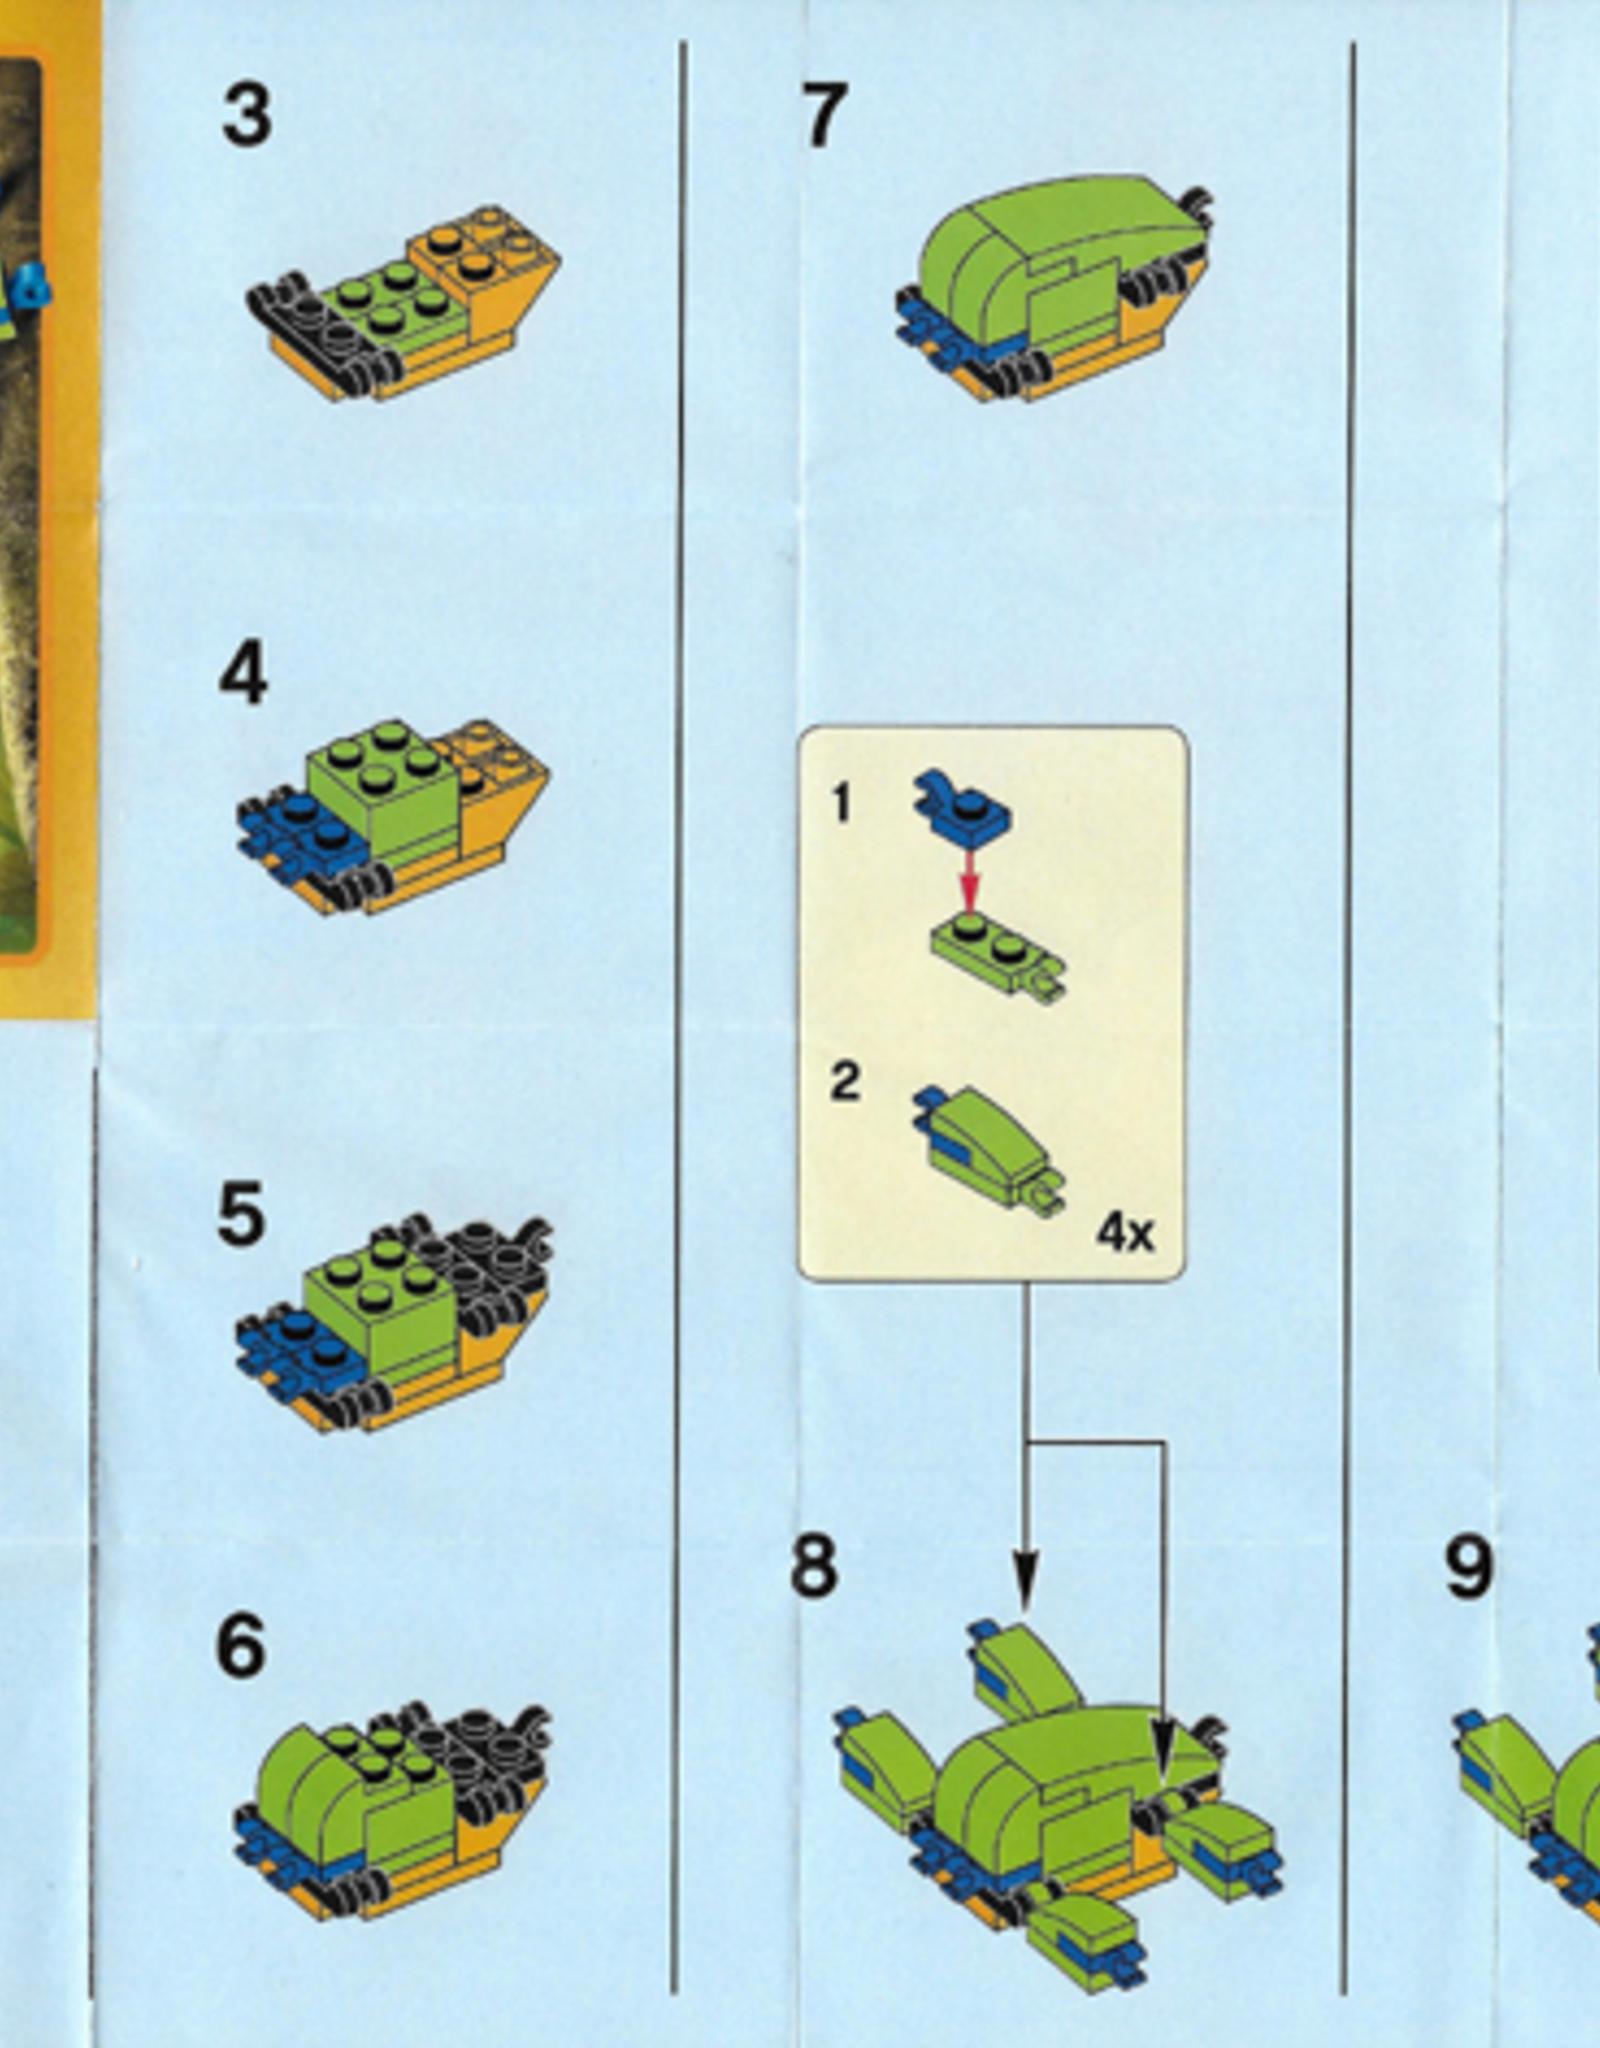 LEGO LEGO 30477 Chameleon CREATOR